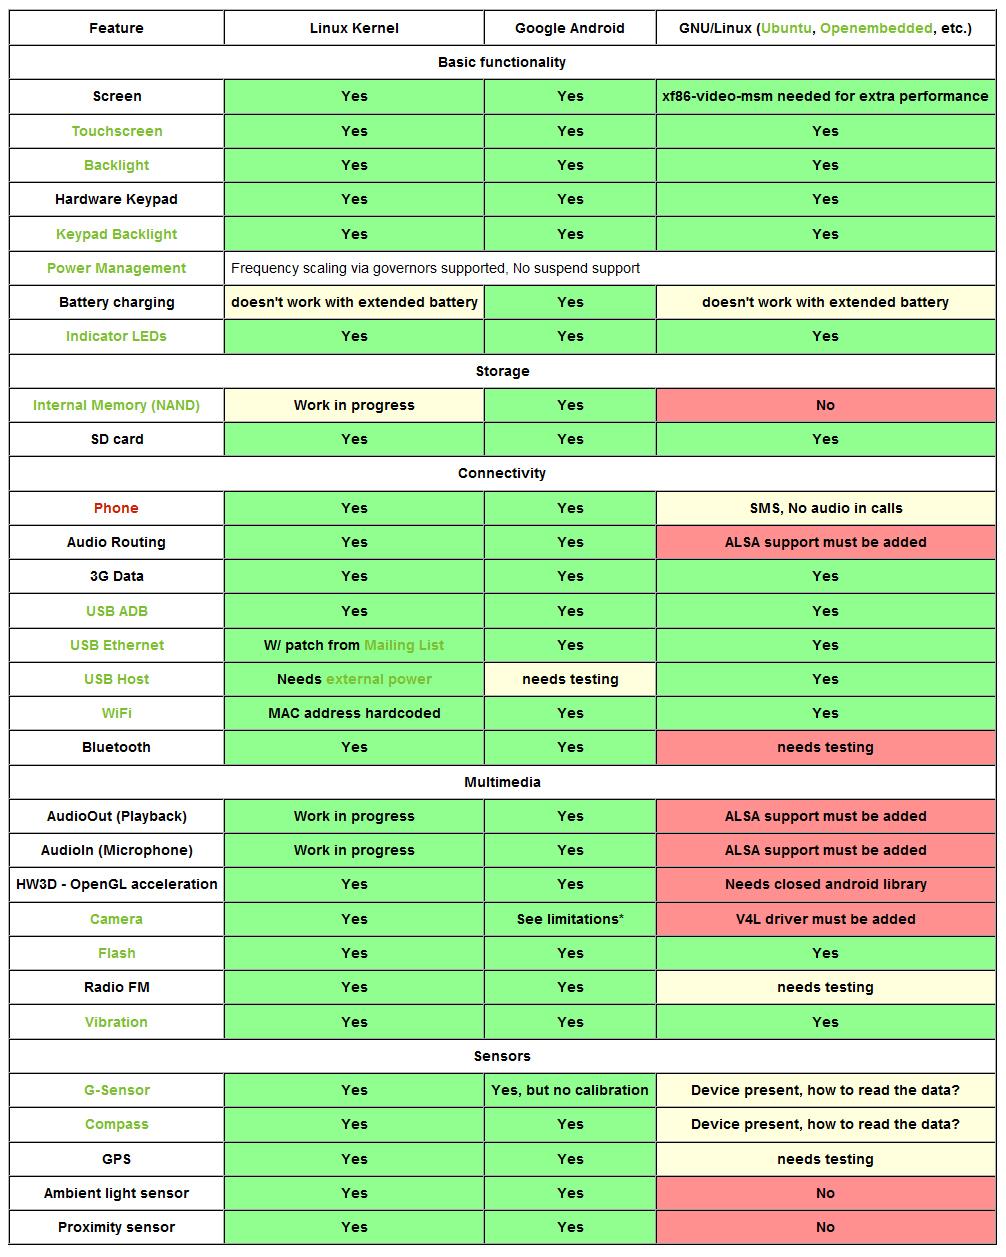 HTC HD2 - есть ли современная альтенатива